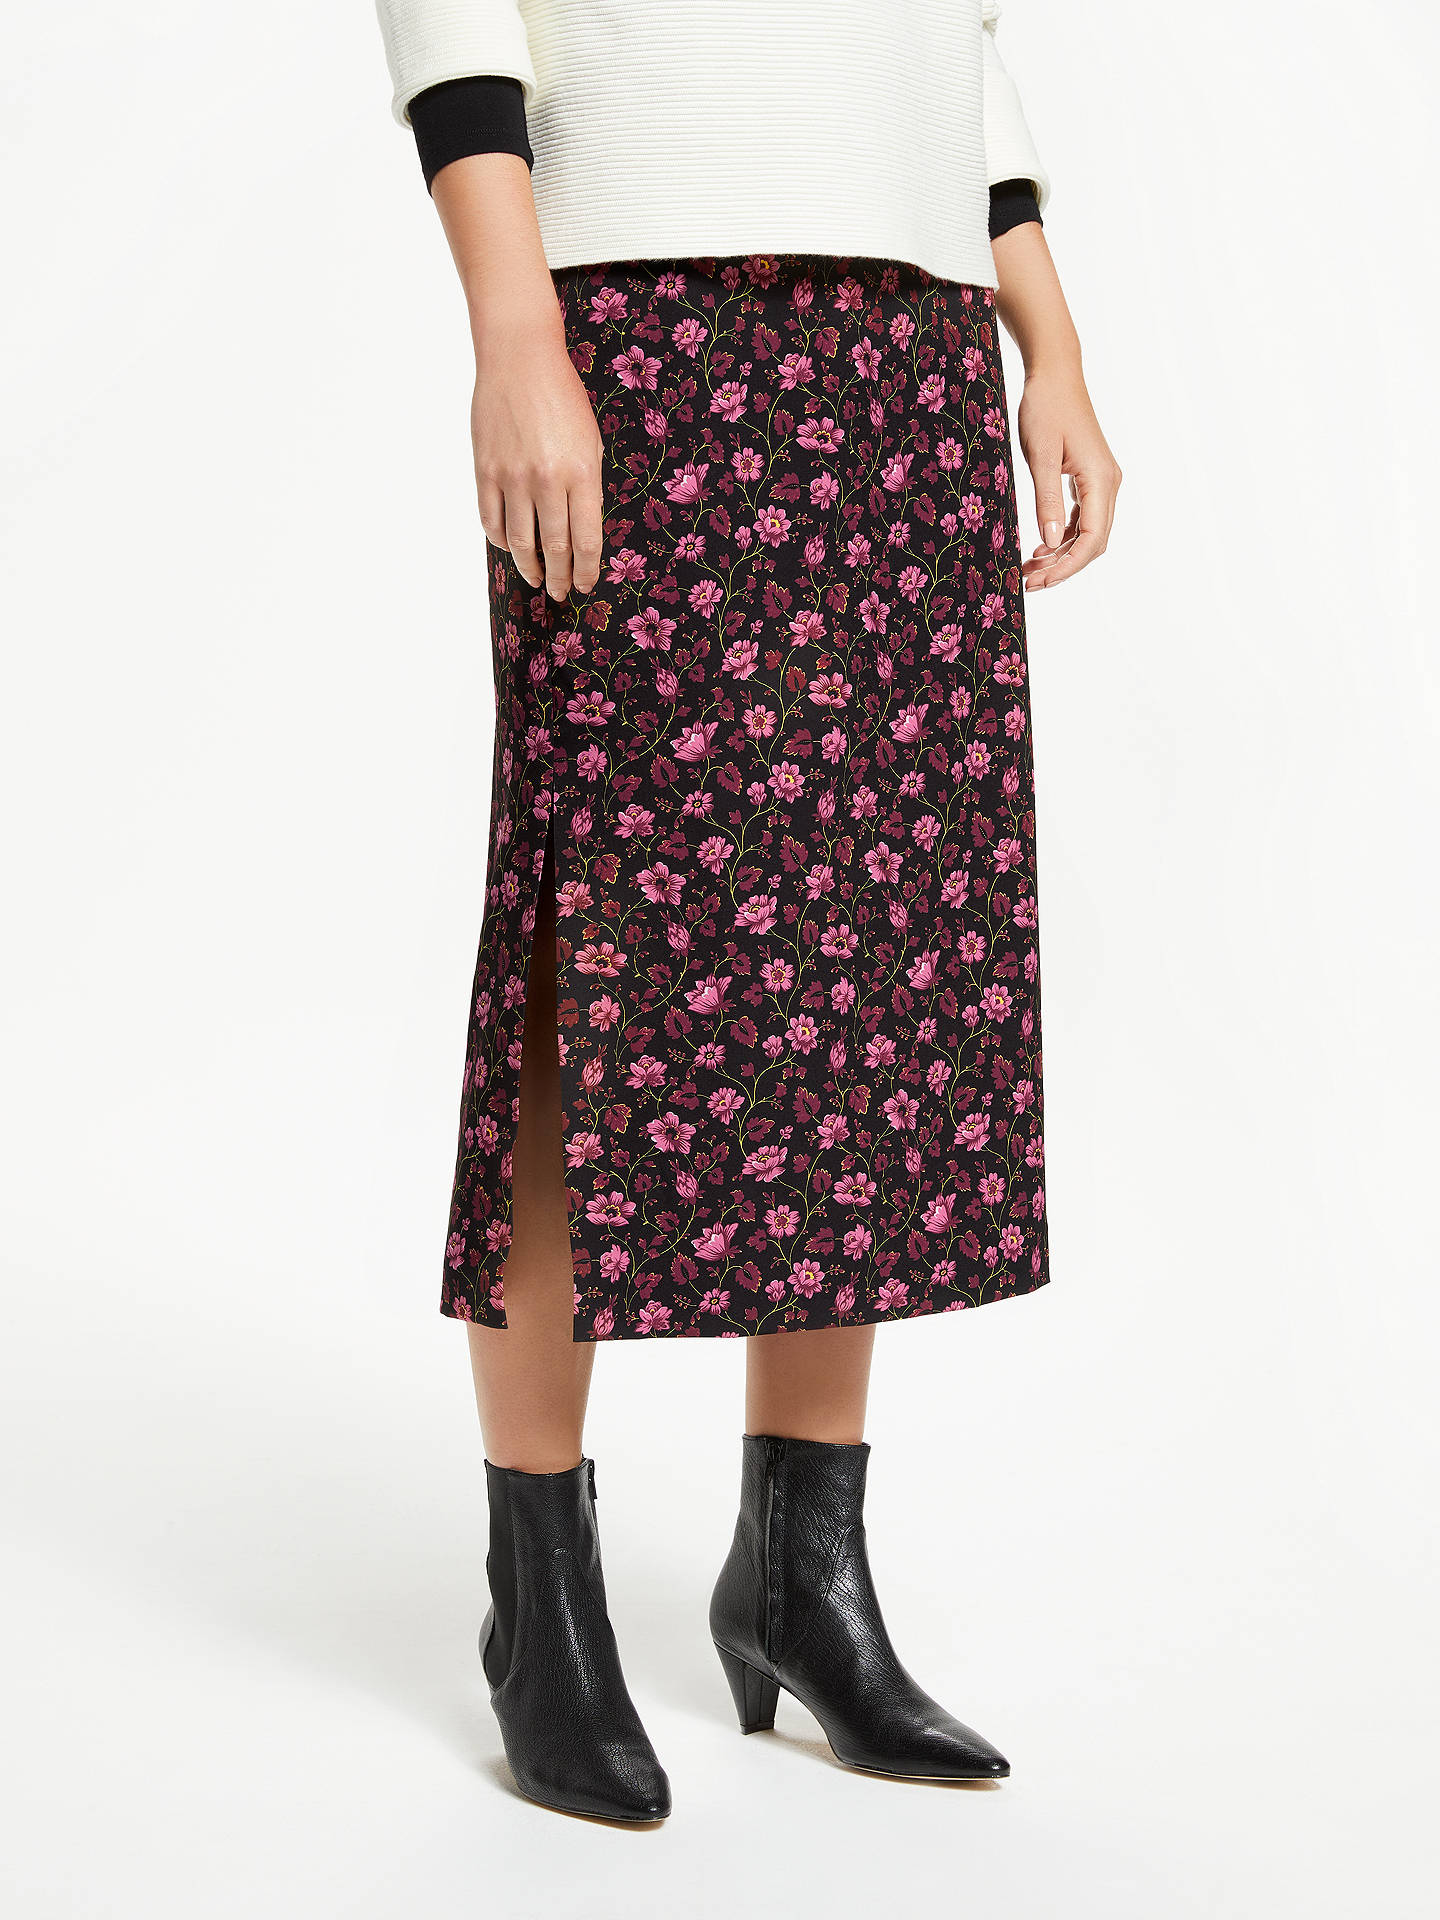 90babe972 Buy Finery Enya Floral Print Side Split Midi Skirt, Multi, 8 Online at  johnlewis ...